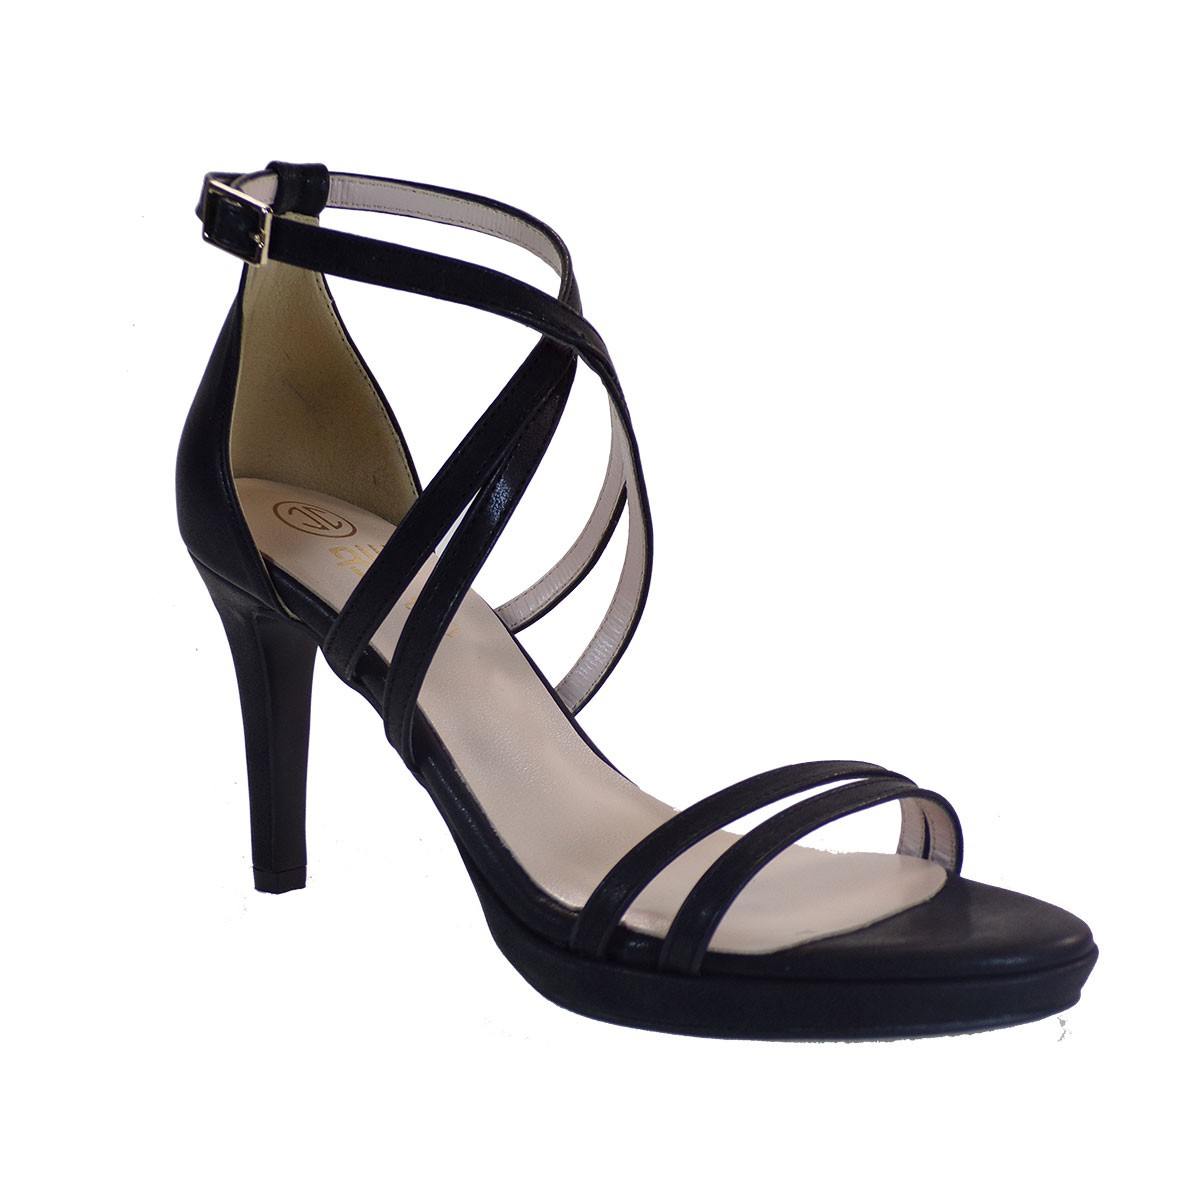 Katia Shoes Γυναικεία Παπούτσια Πέδιλα A16-4967 Μαύρο